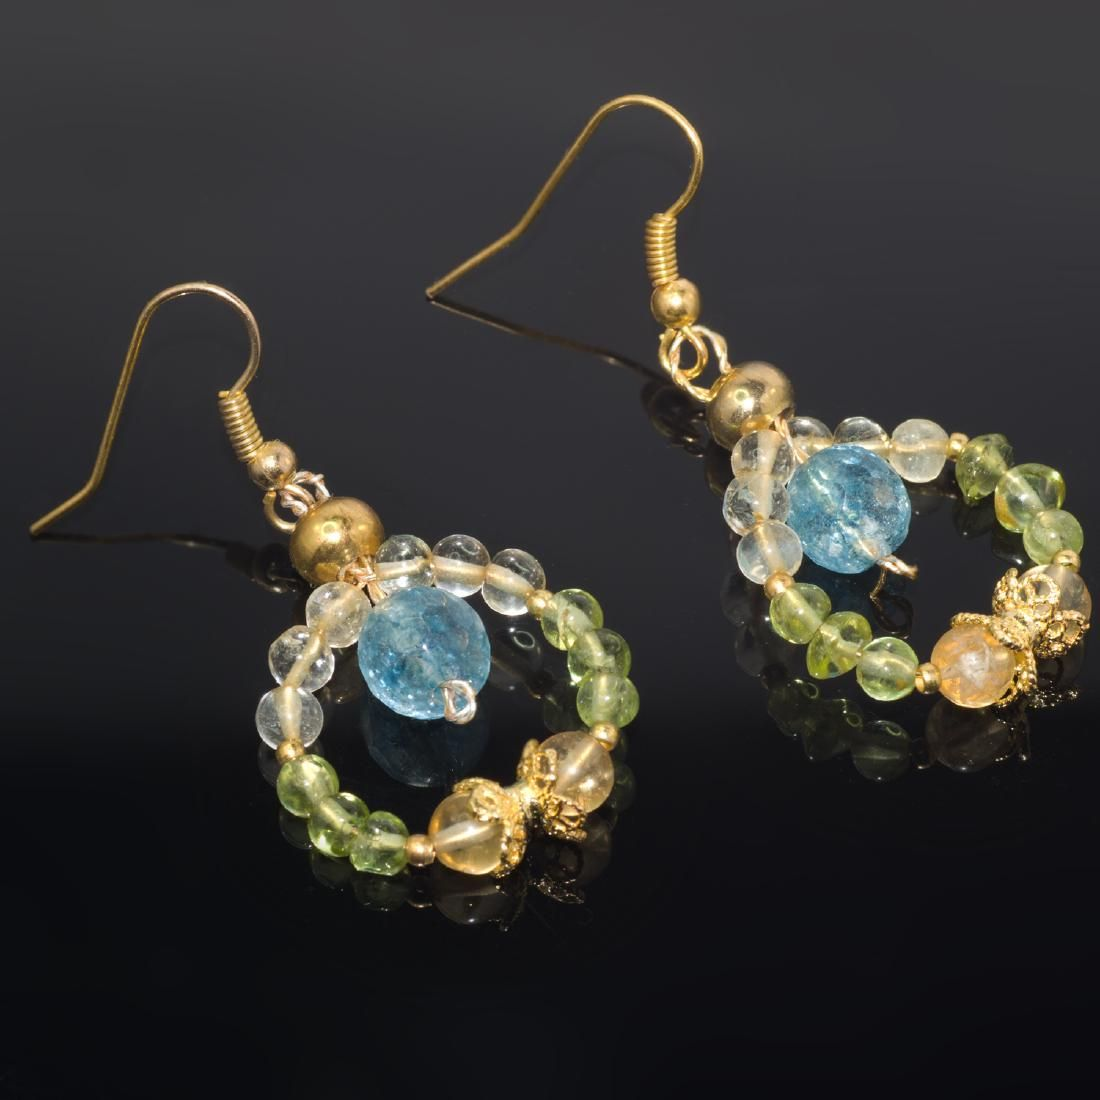 Multi-Gemstone 'Fairy Tail' Earrings